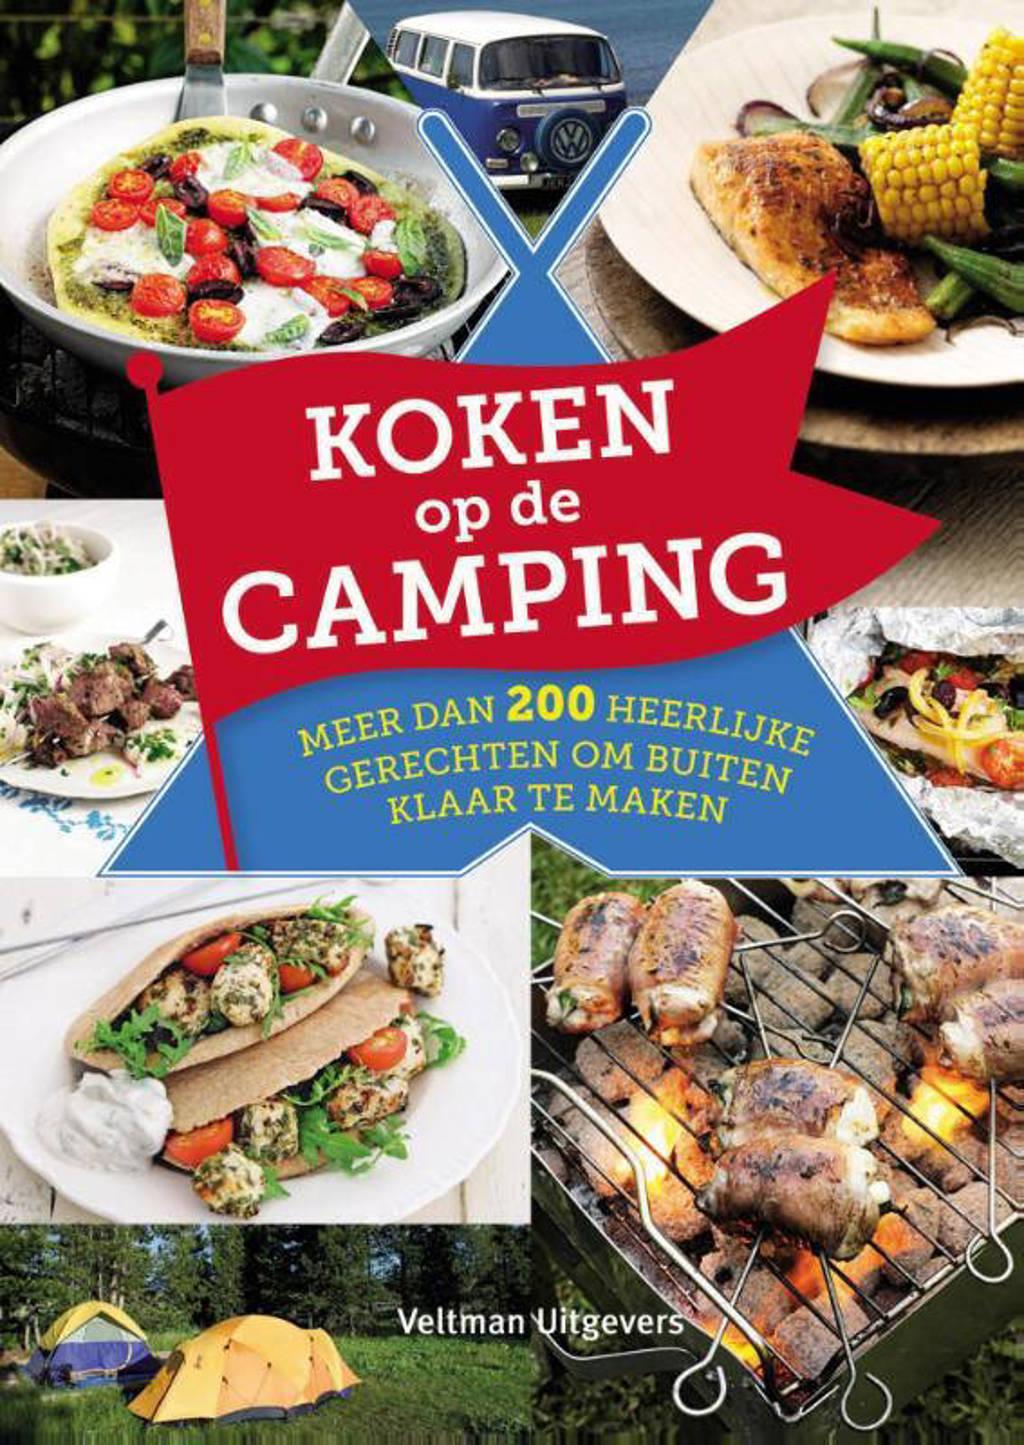 Koken op de camping - Cara Frost-Sharratt